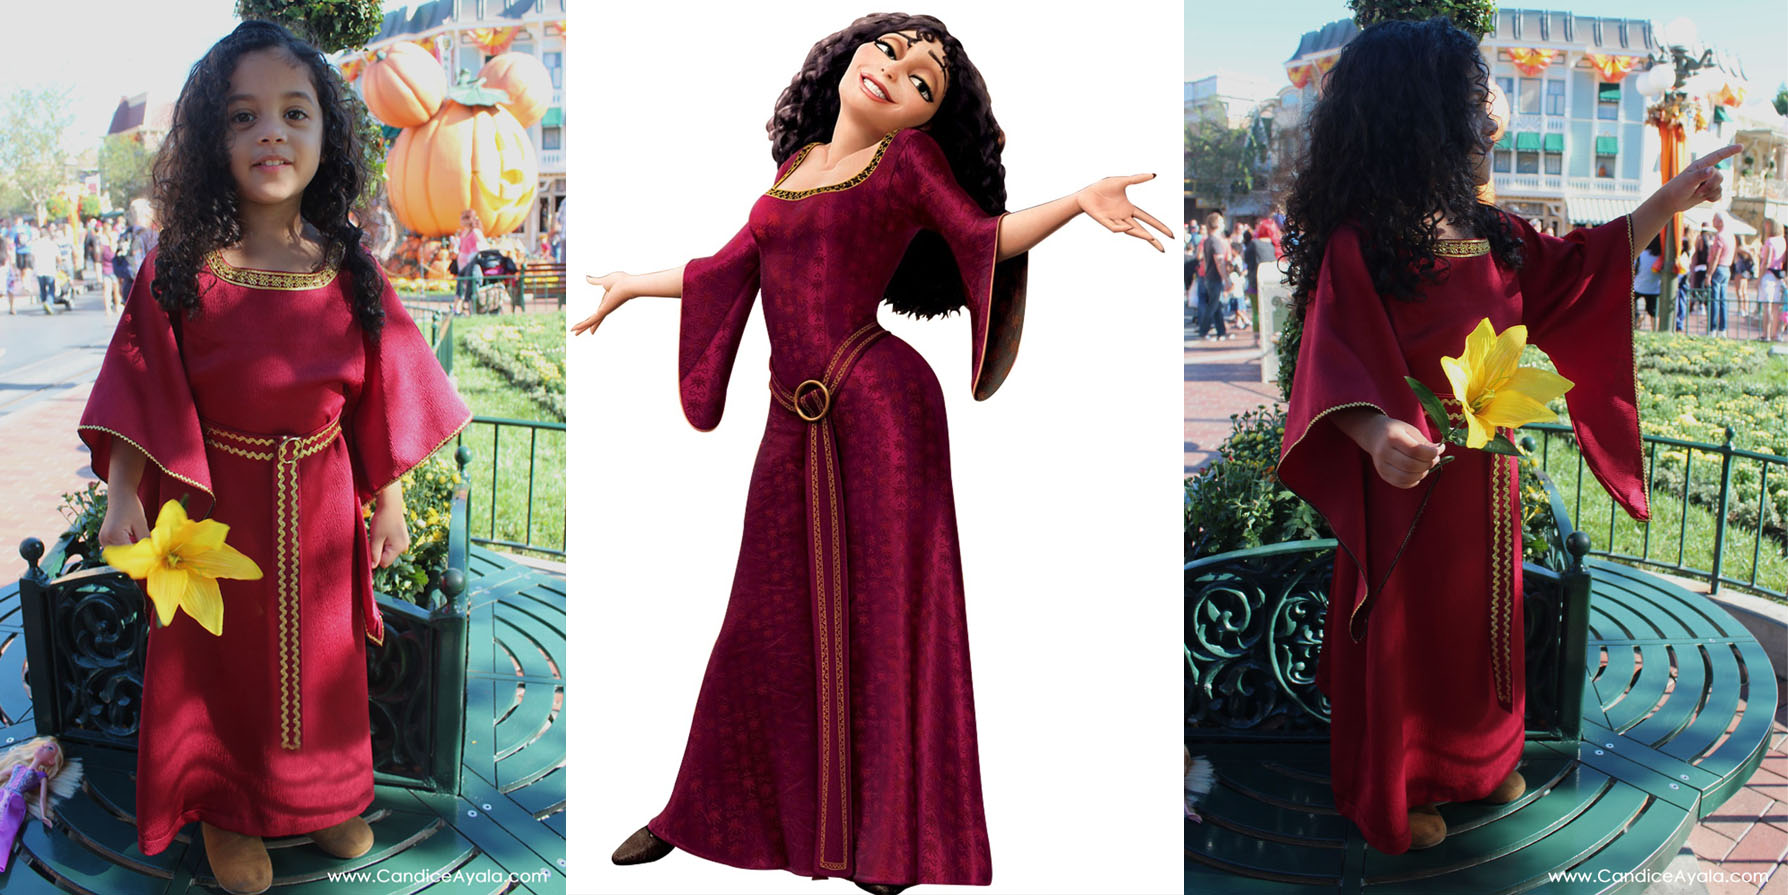 Disney Villain Halloween Costumes Diy.Halloween At Disneyland 2015 Diy Mother Gothel Costume Candice Ayala